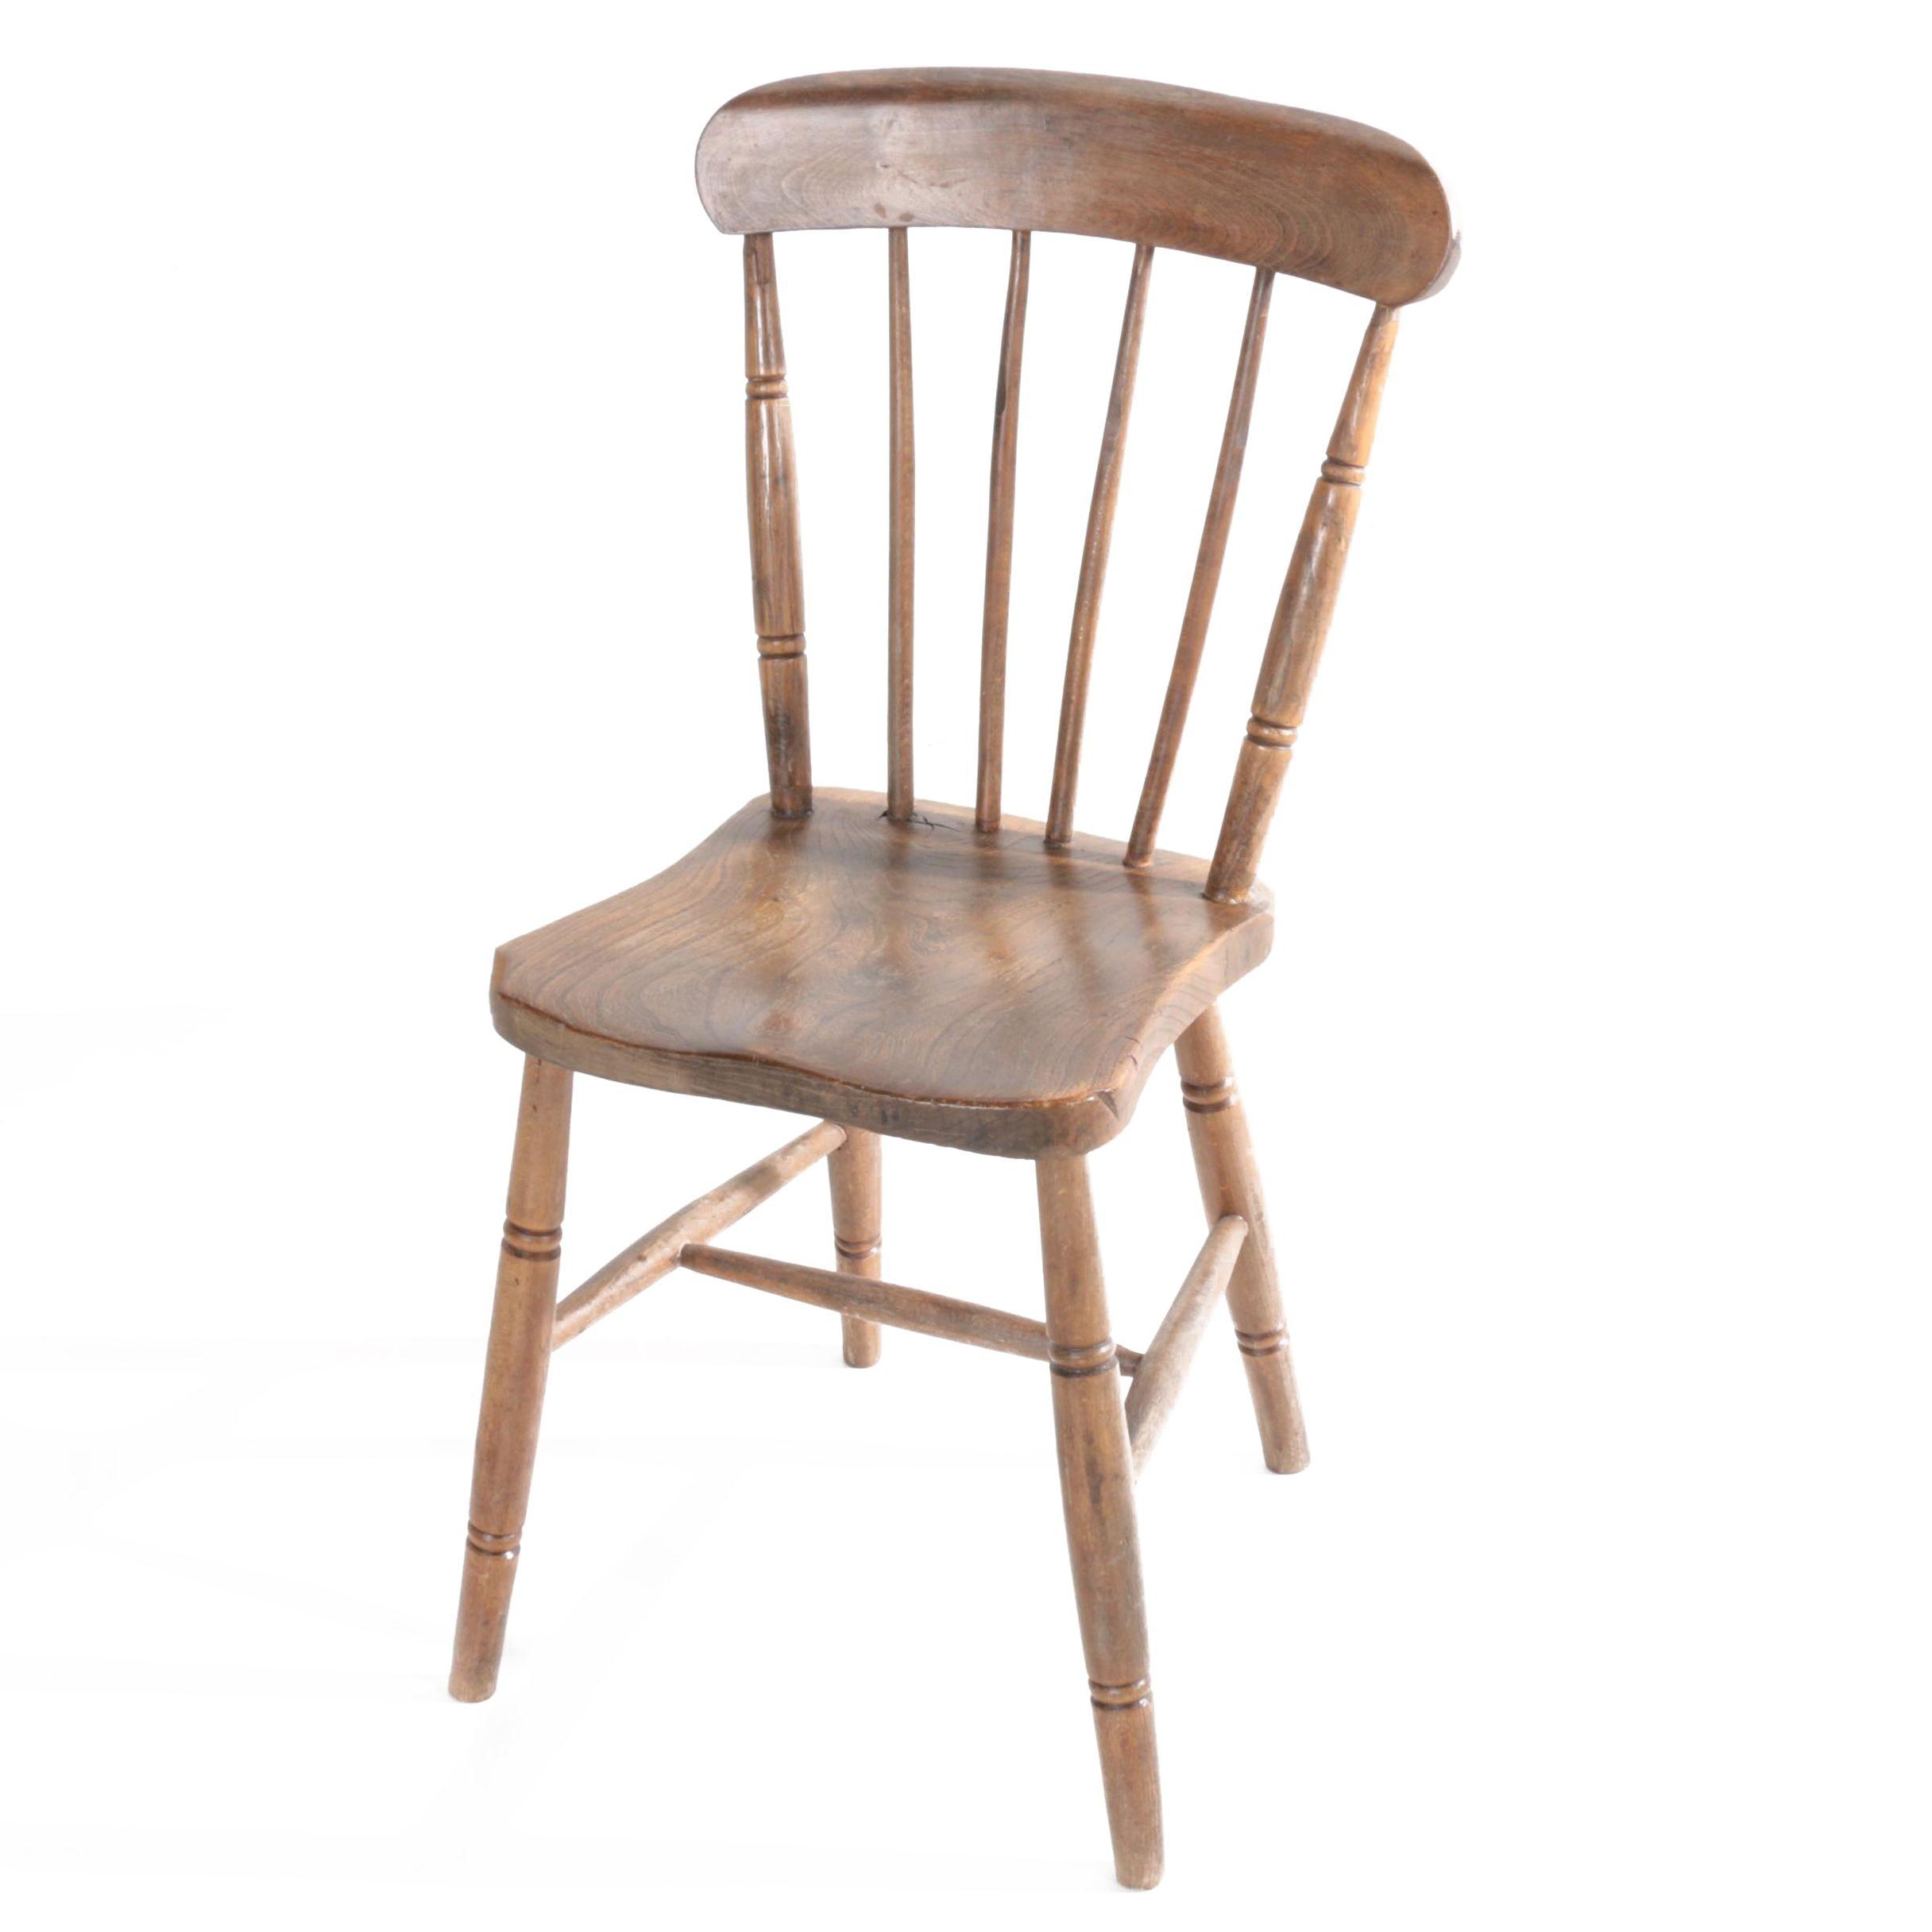 Vintage Windsor Chair